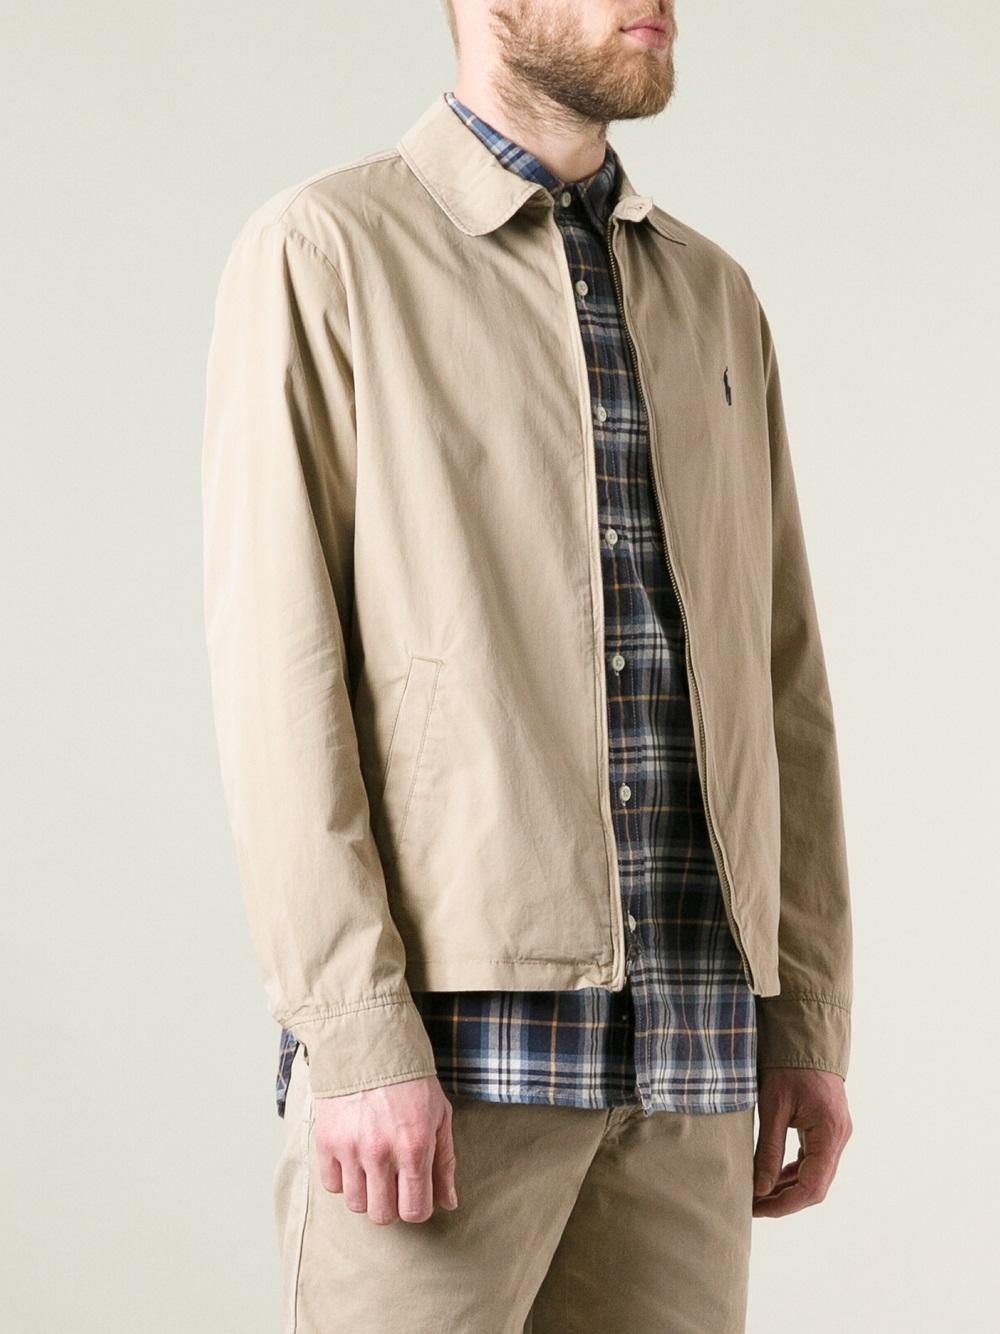 polo ralph lauren classic harrington jacket in natural for. Black Bedroom Furniture Sets. Home Design Ideas